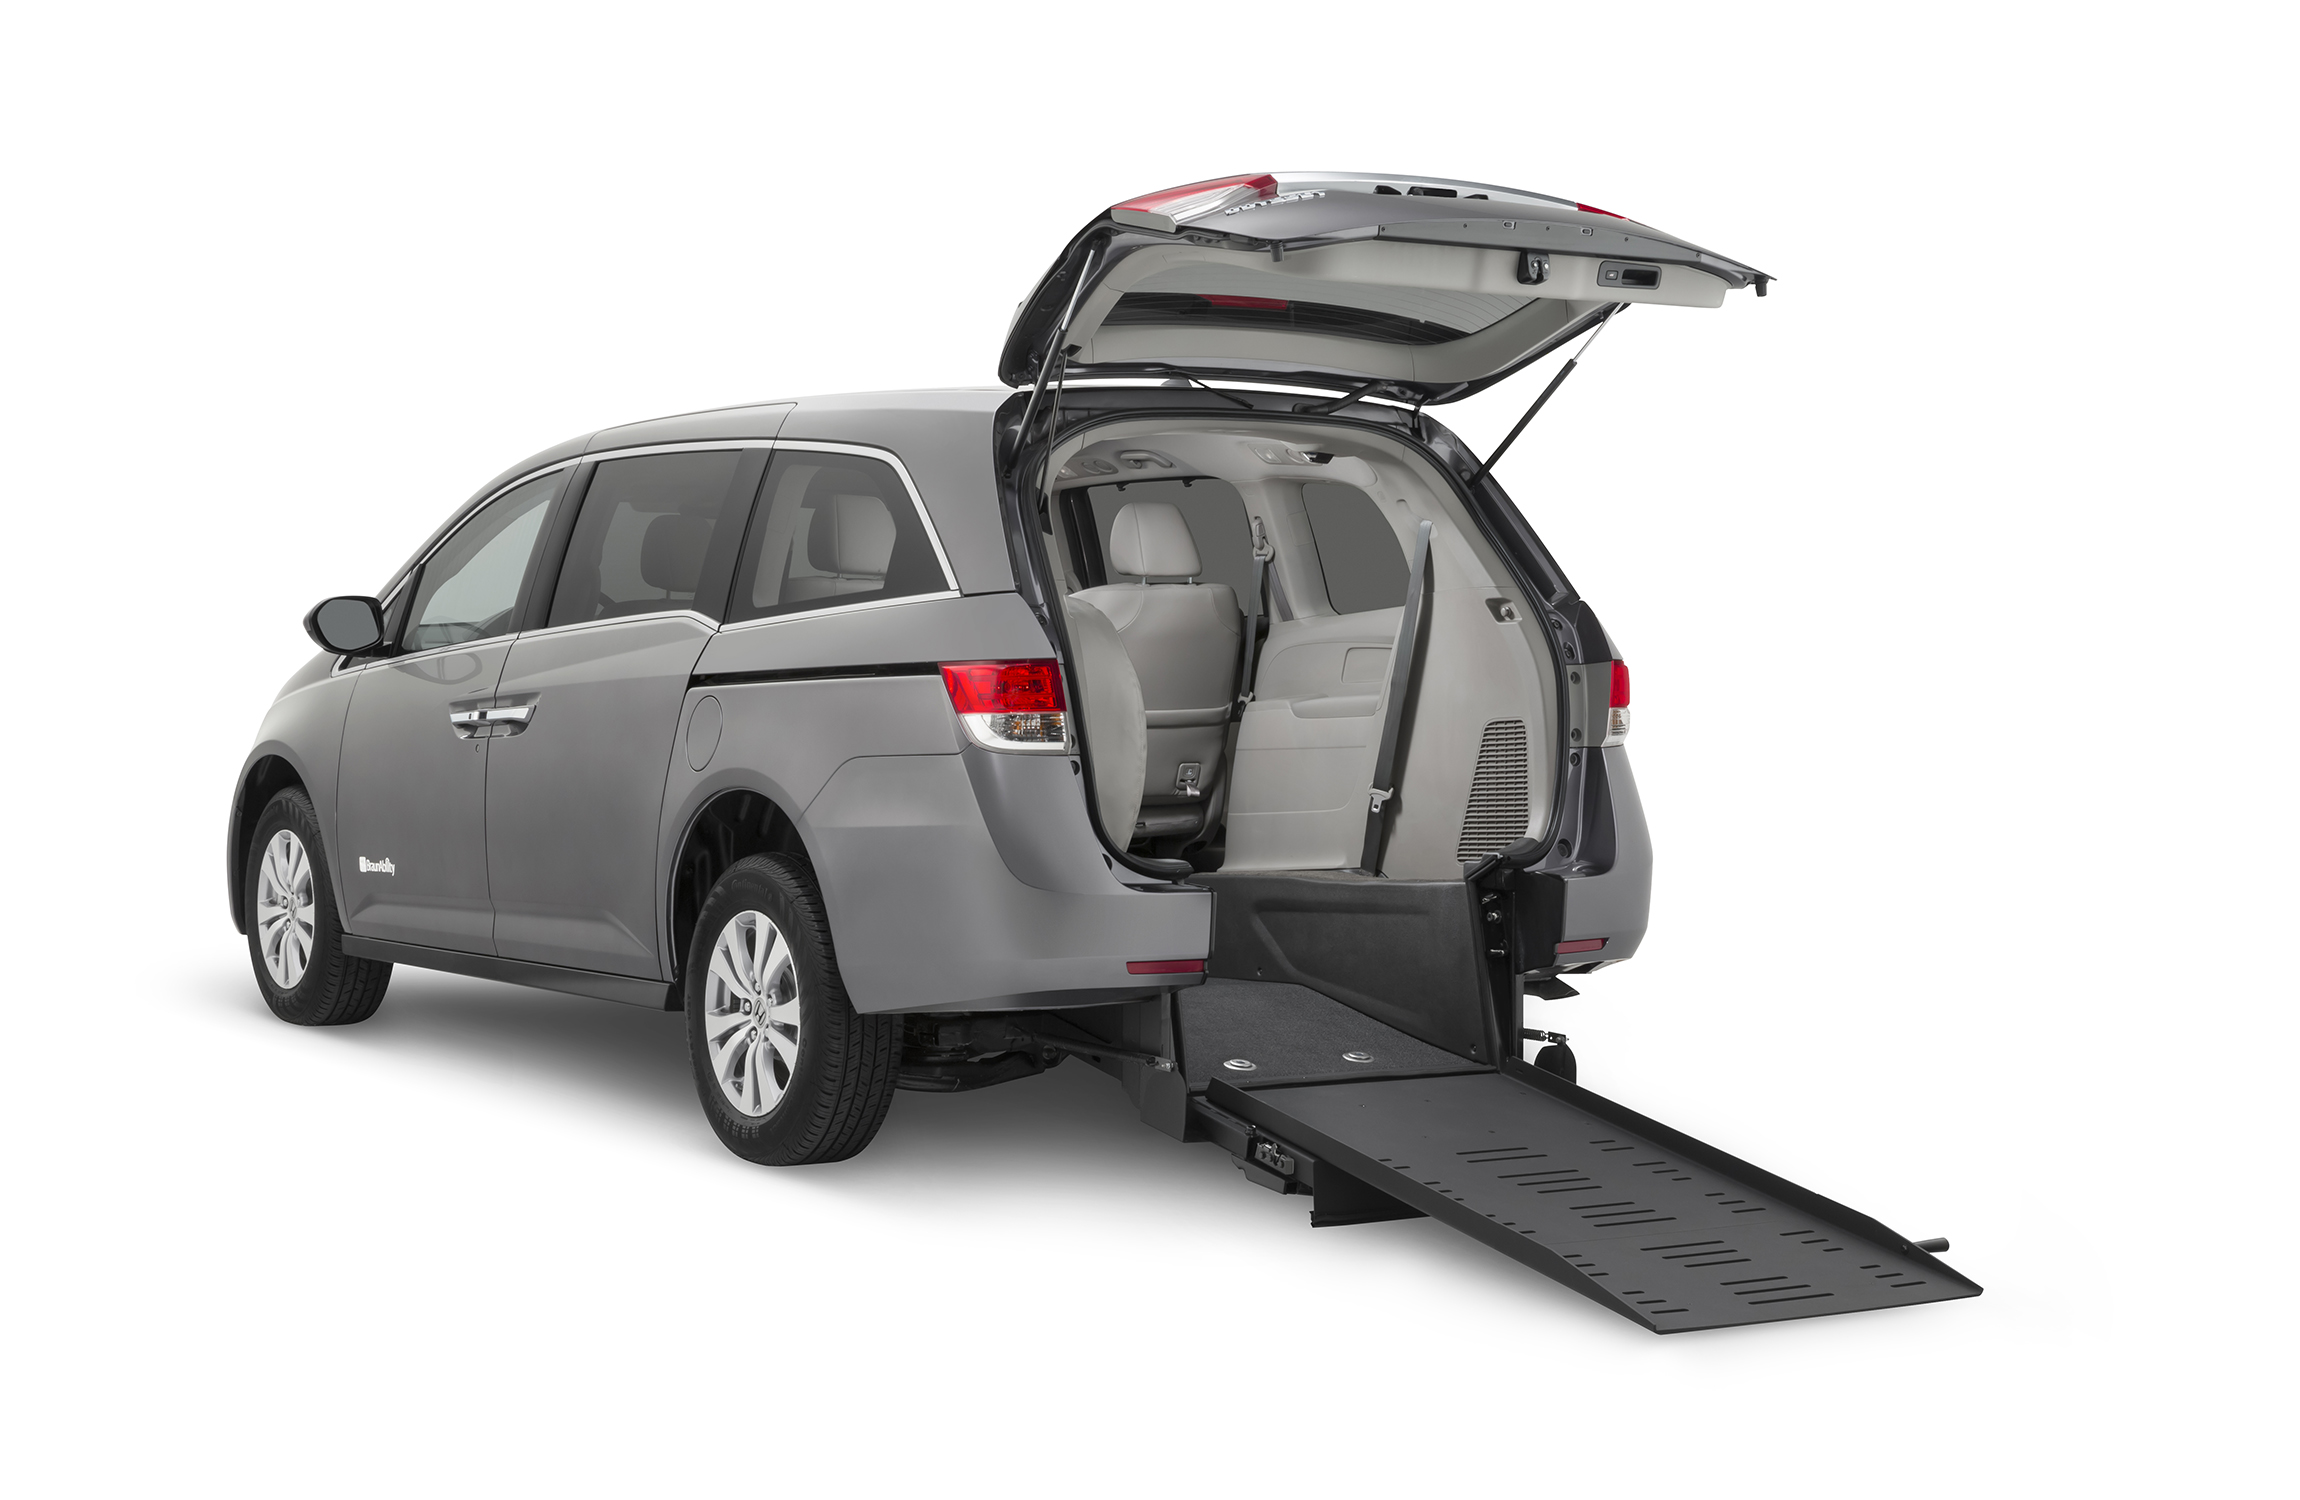 Costco Auto Program >> Costco Auto Program Announces New Mobility Vehicle Offerings for Costco Members